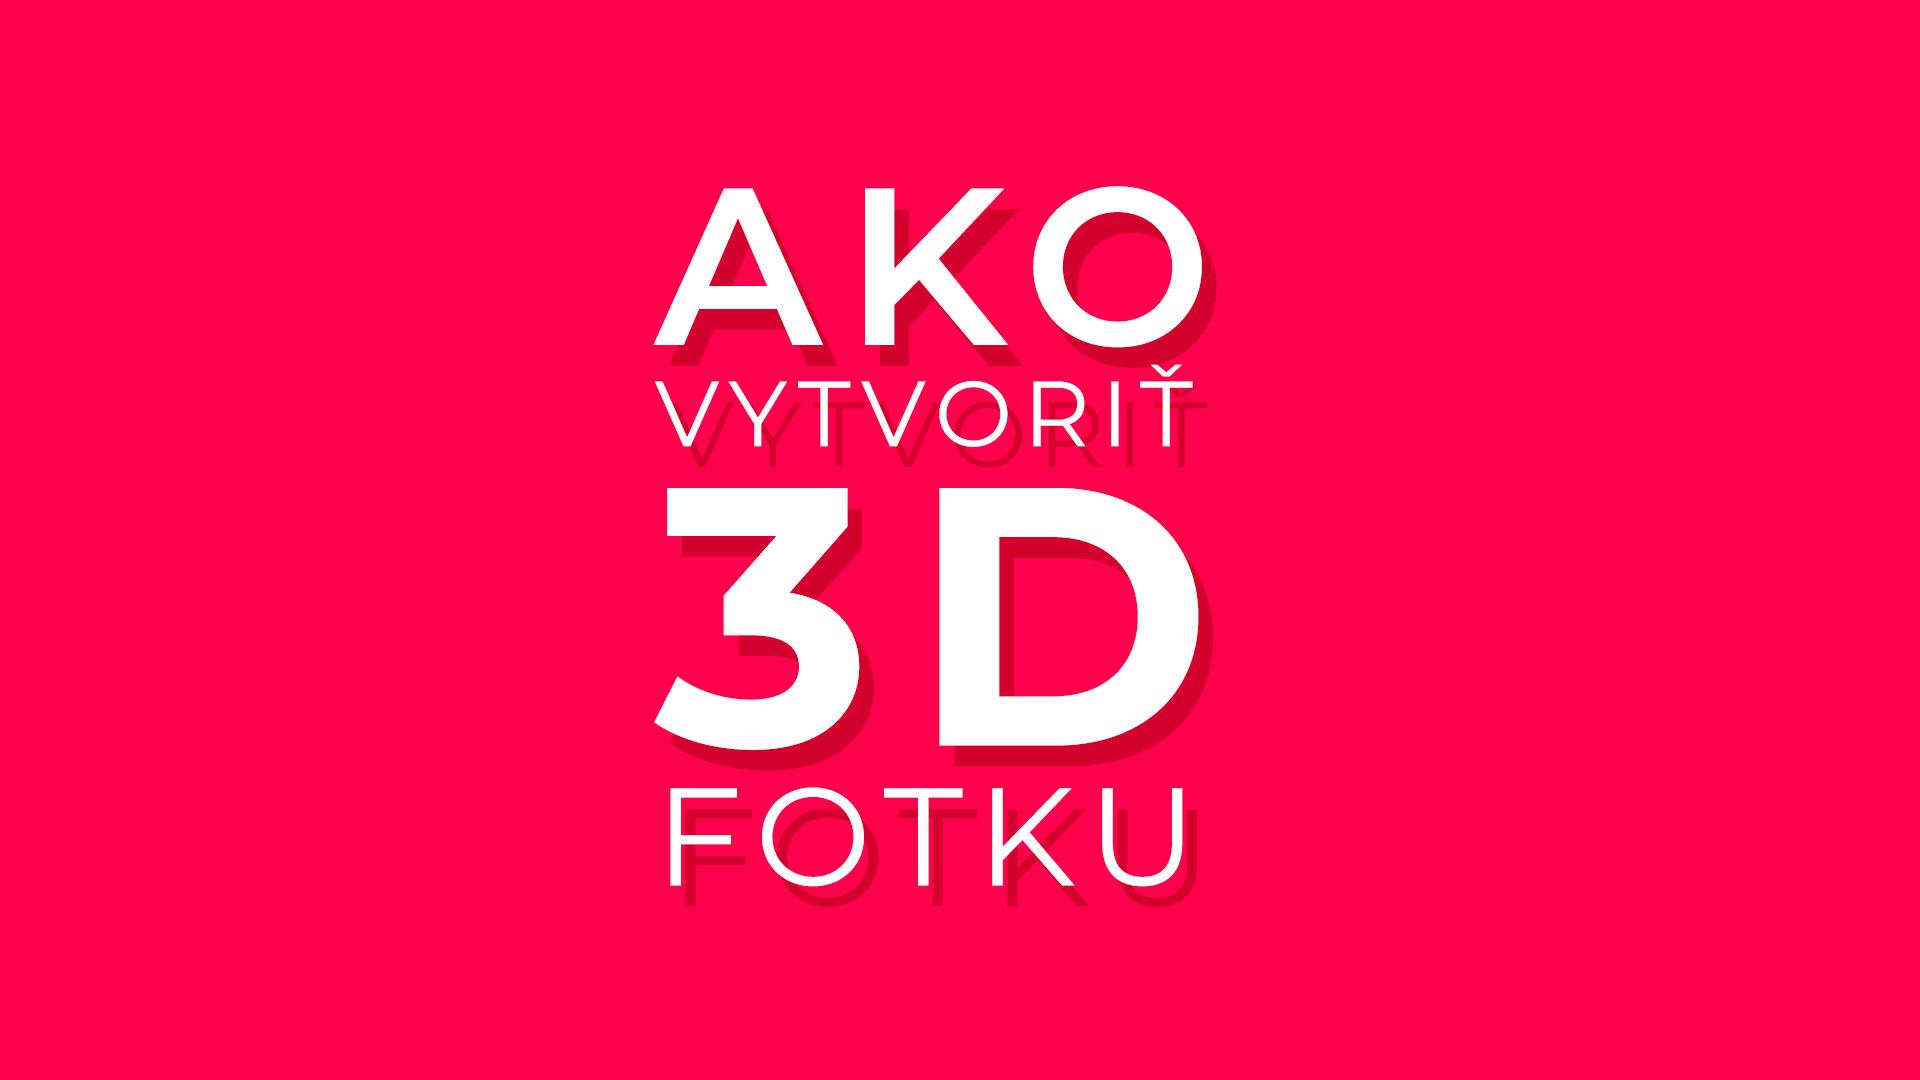 ako 3d fotka facebook